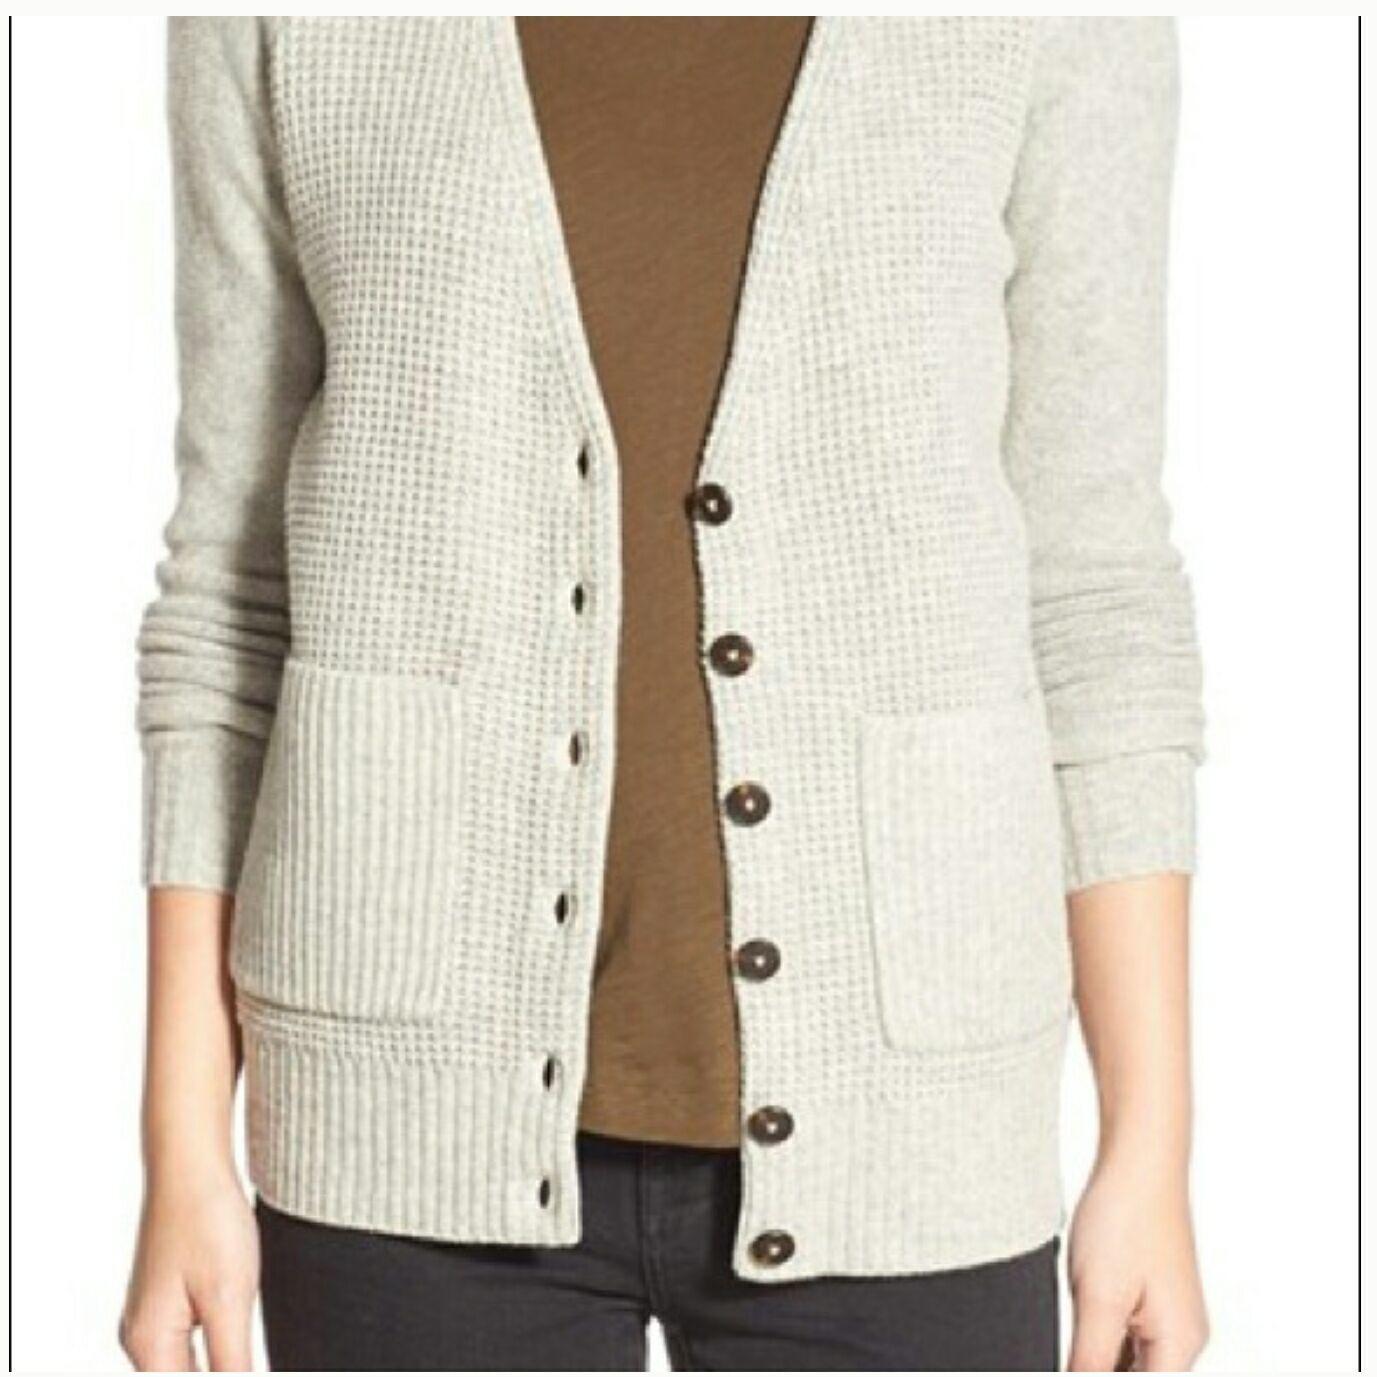 Madewell Unniversity Cardigan 100% Wool - Mercari: BUY & SELL ...